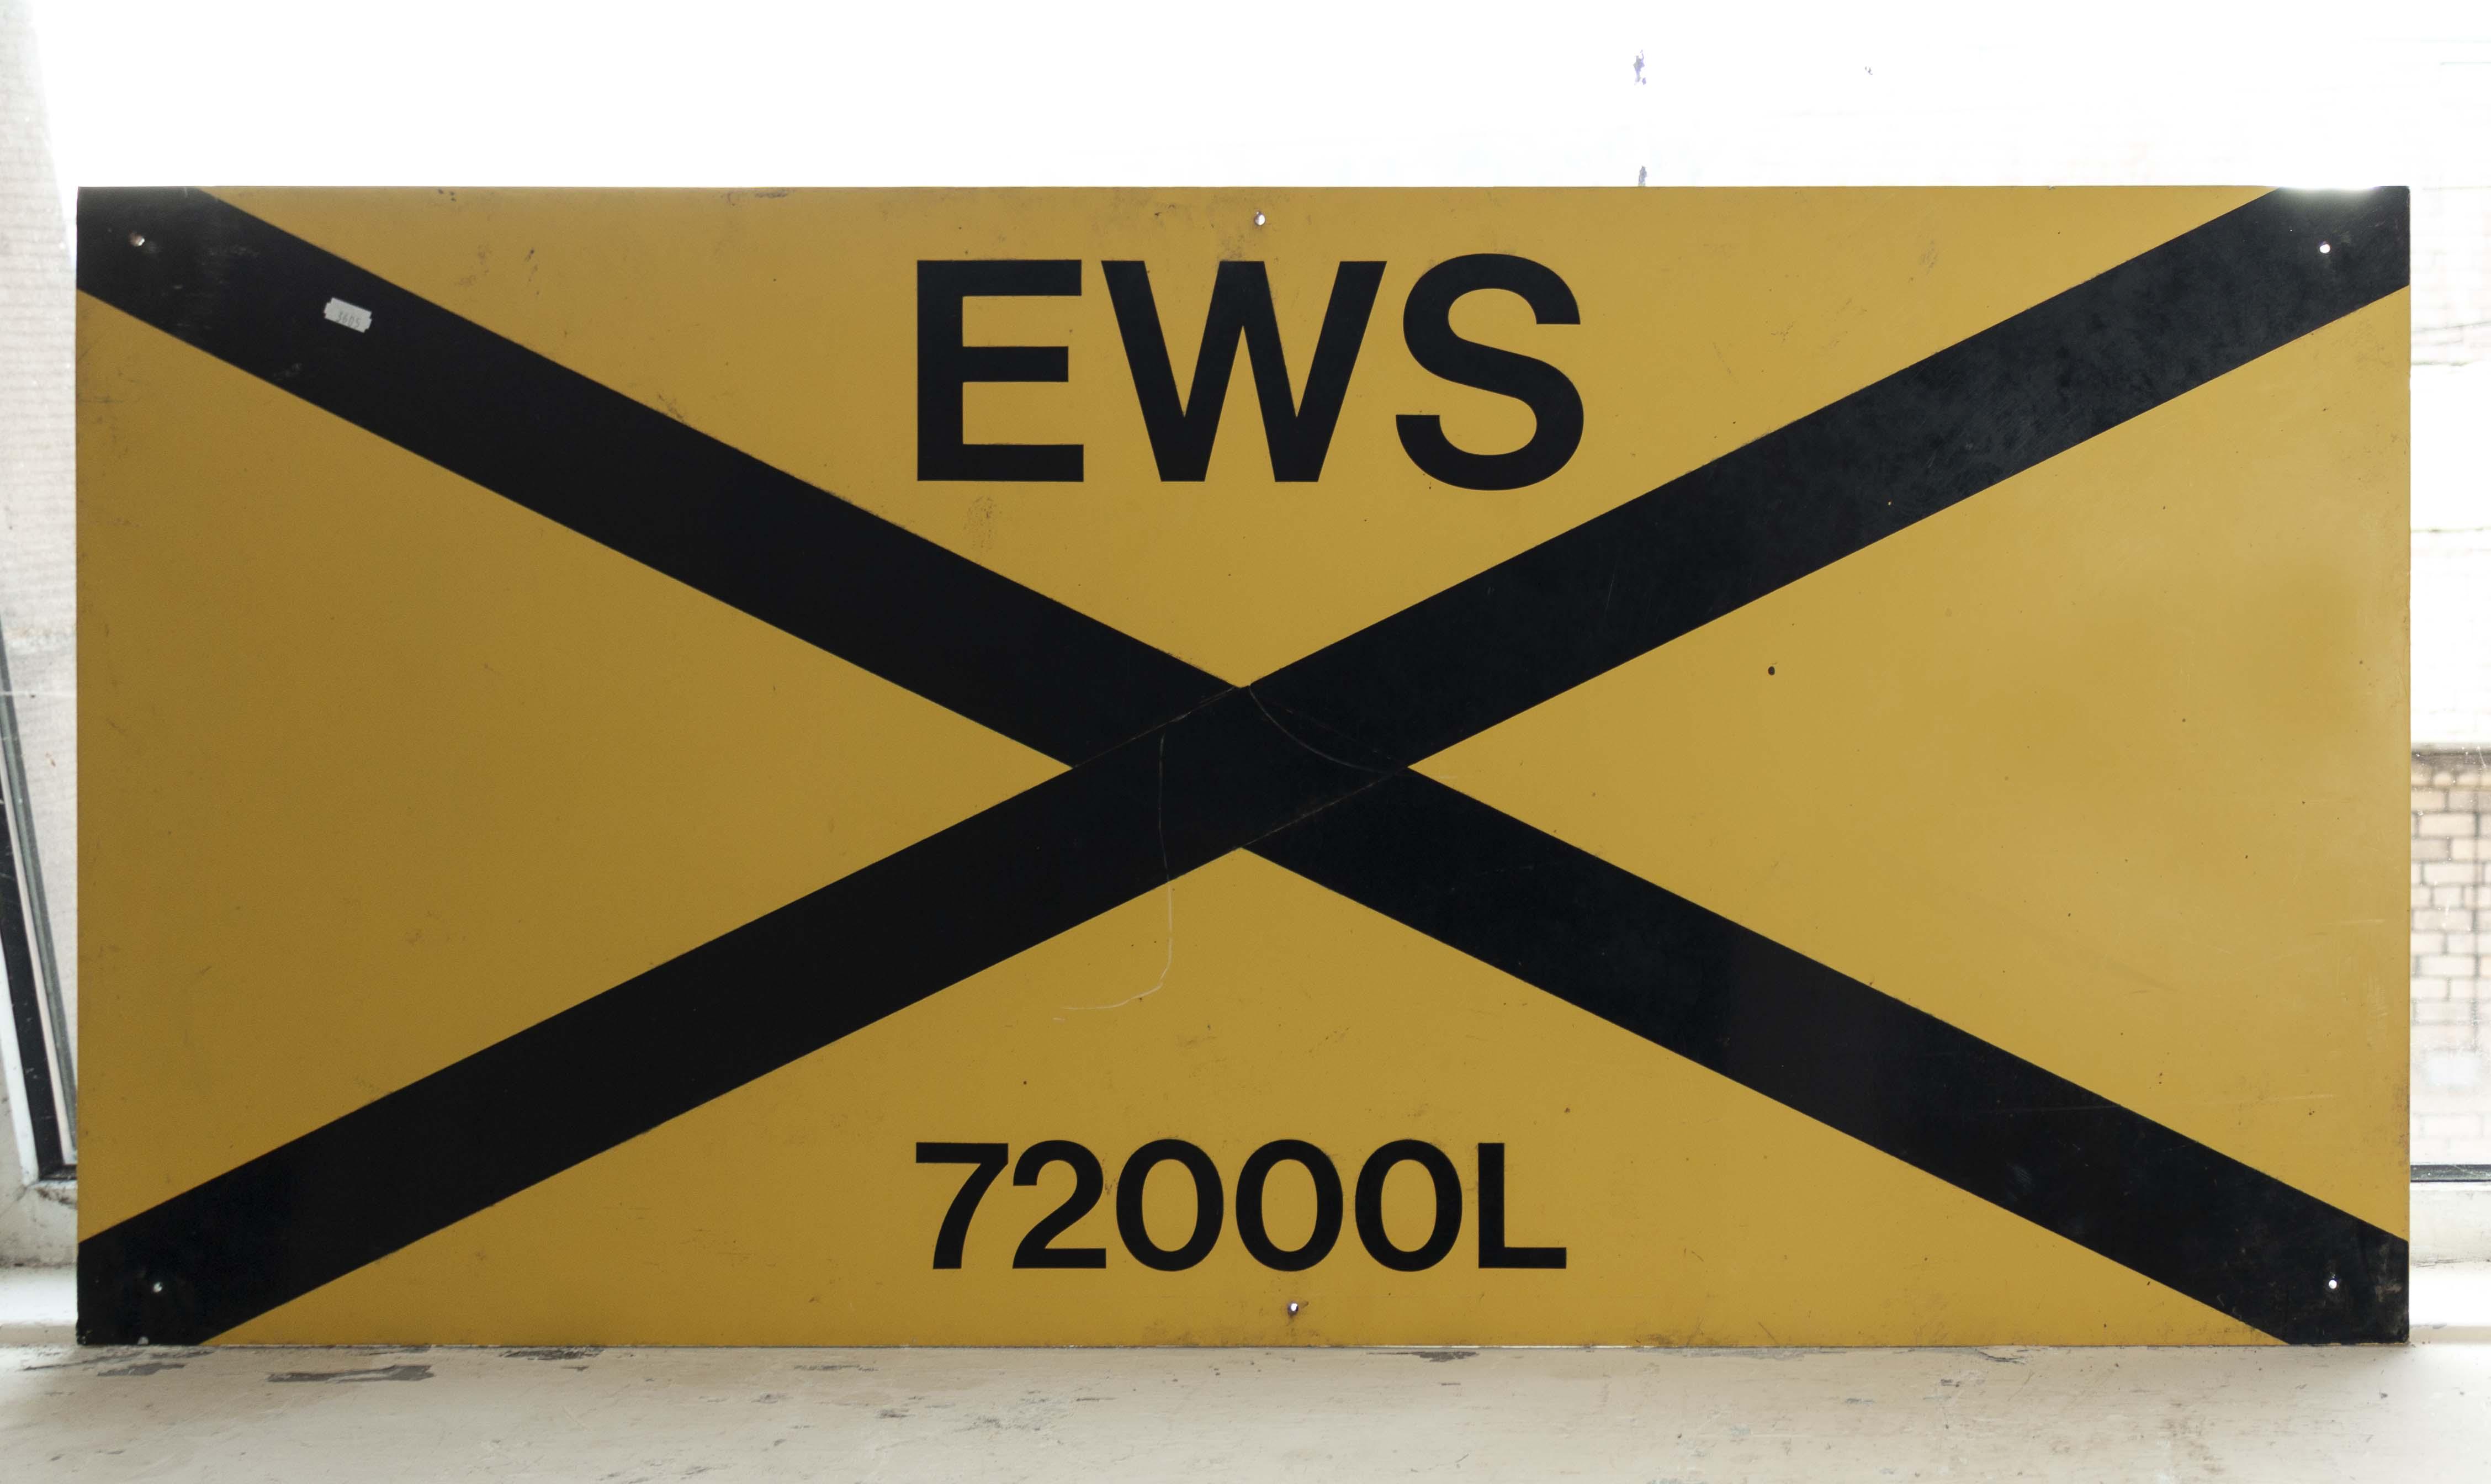 Lot 7 - An EWS railway sign